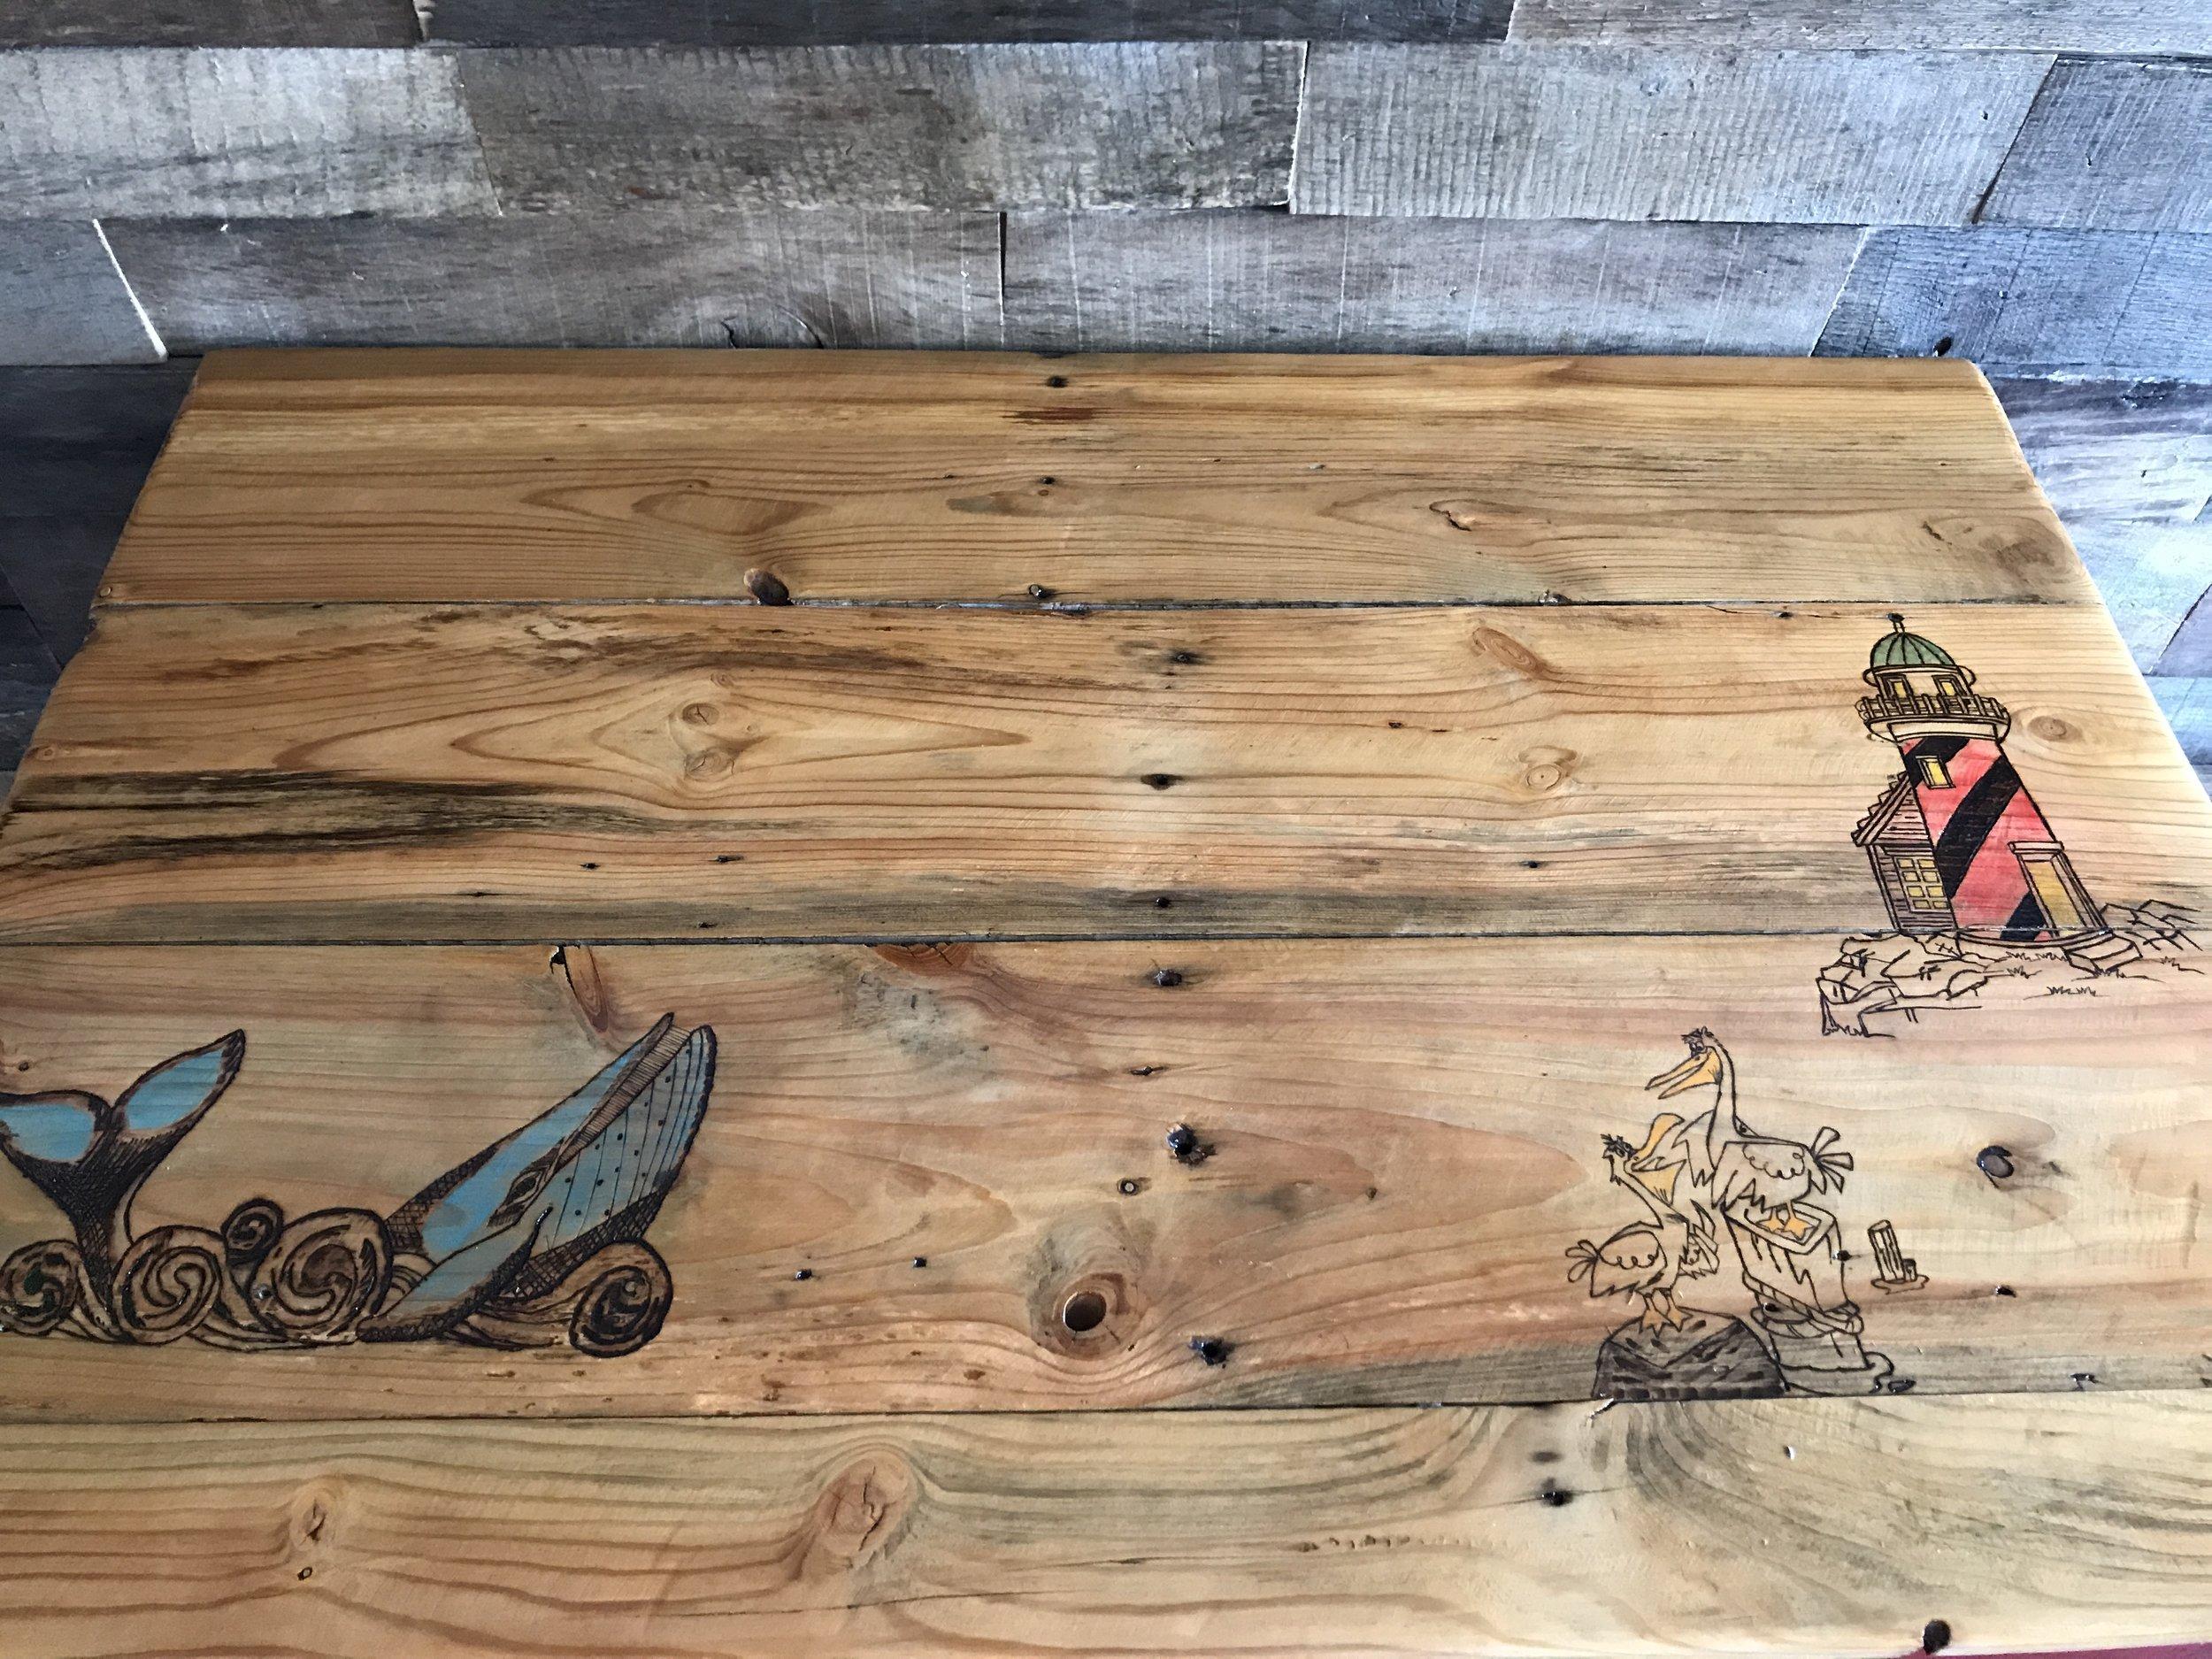 Wood burning on repurposed old barn-board countertop.